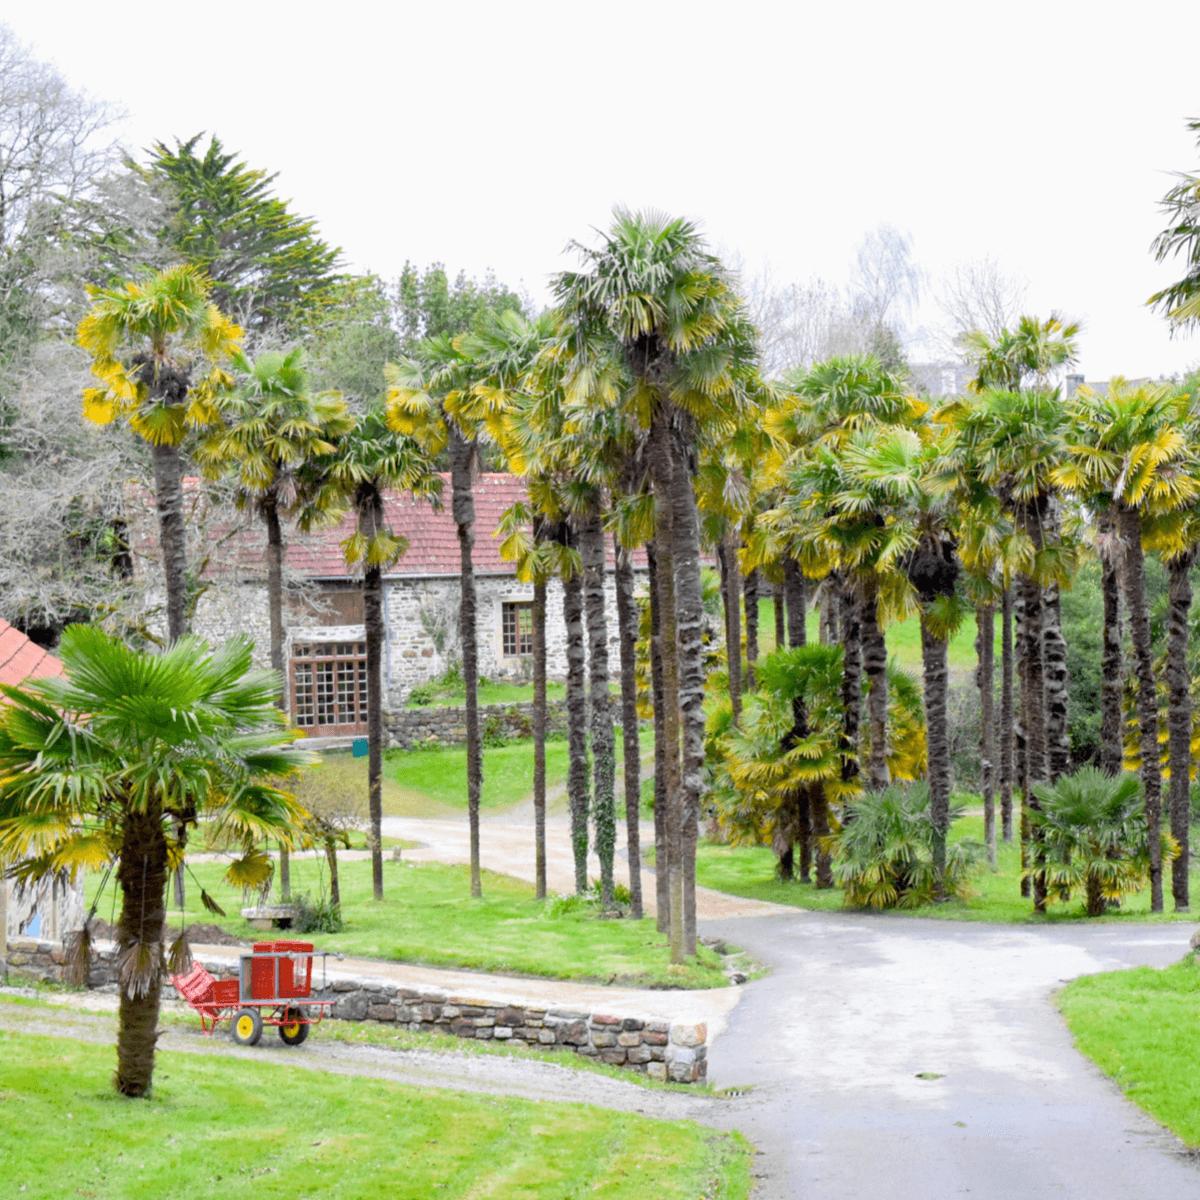 Les plantes exotiques de l'abbaye de Landévennec